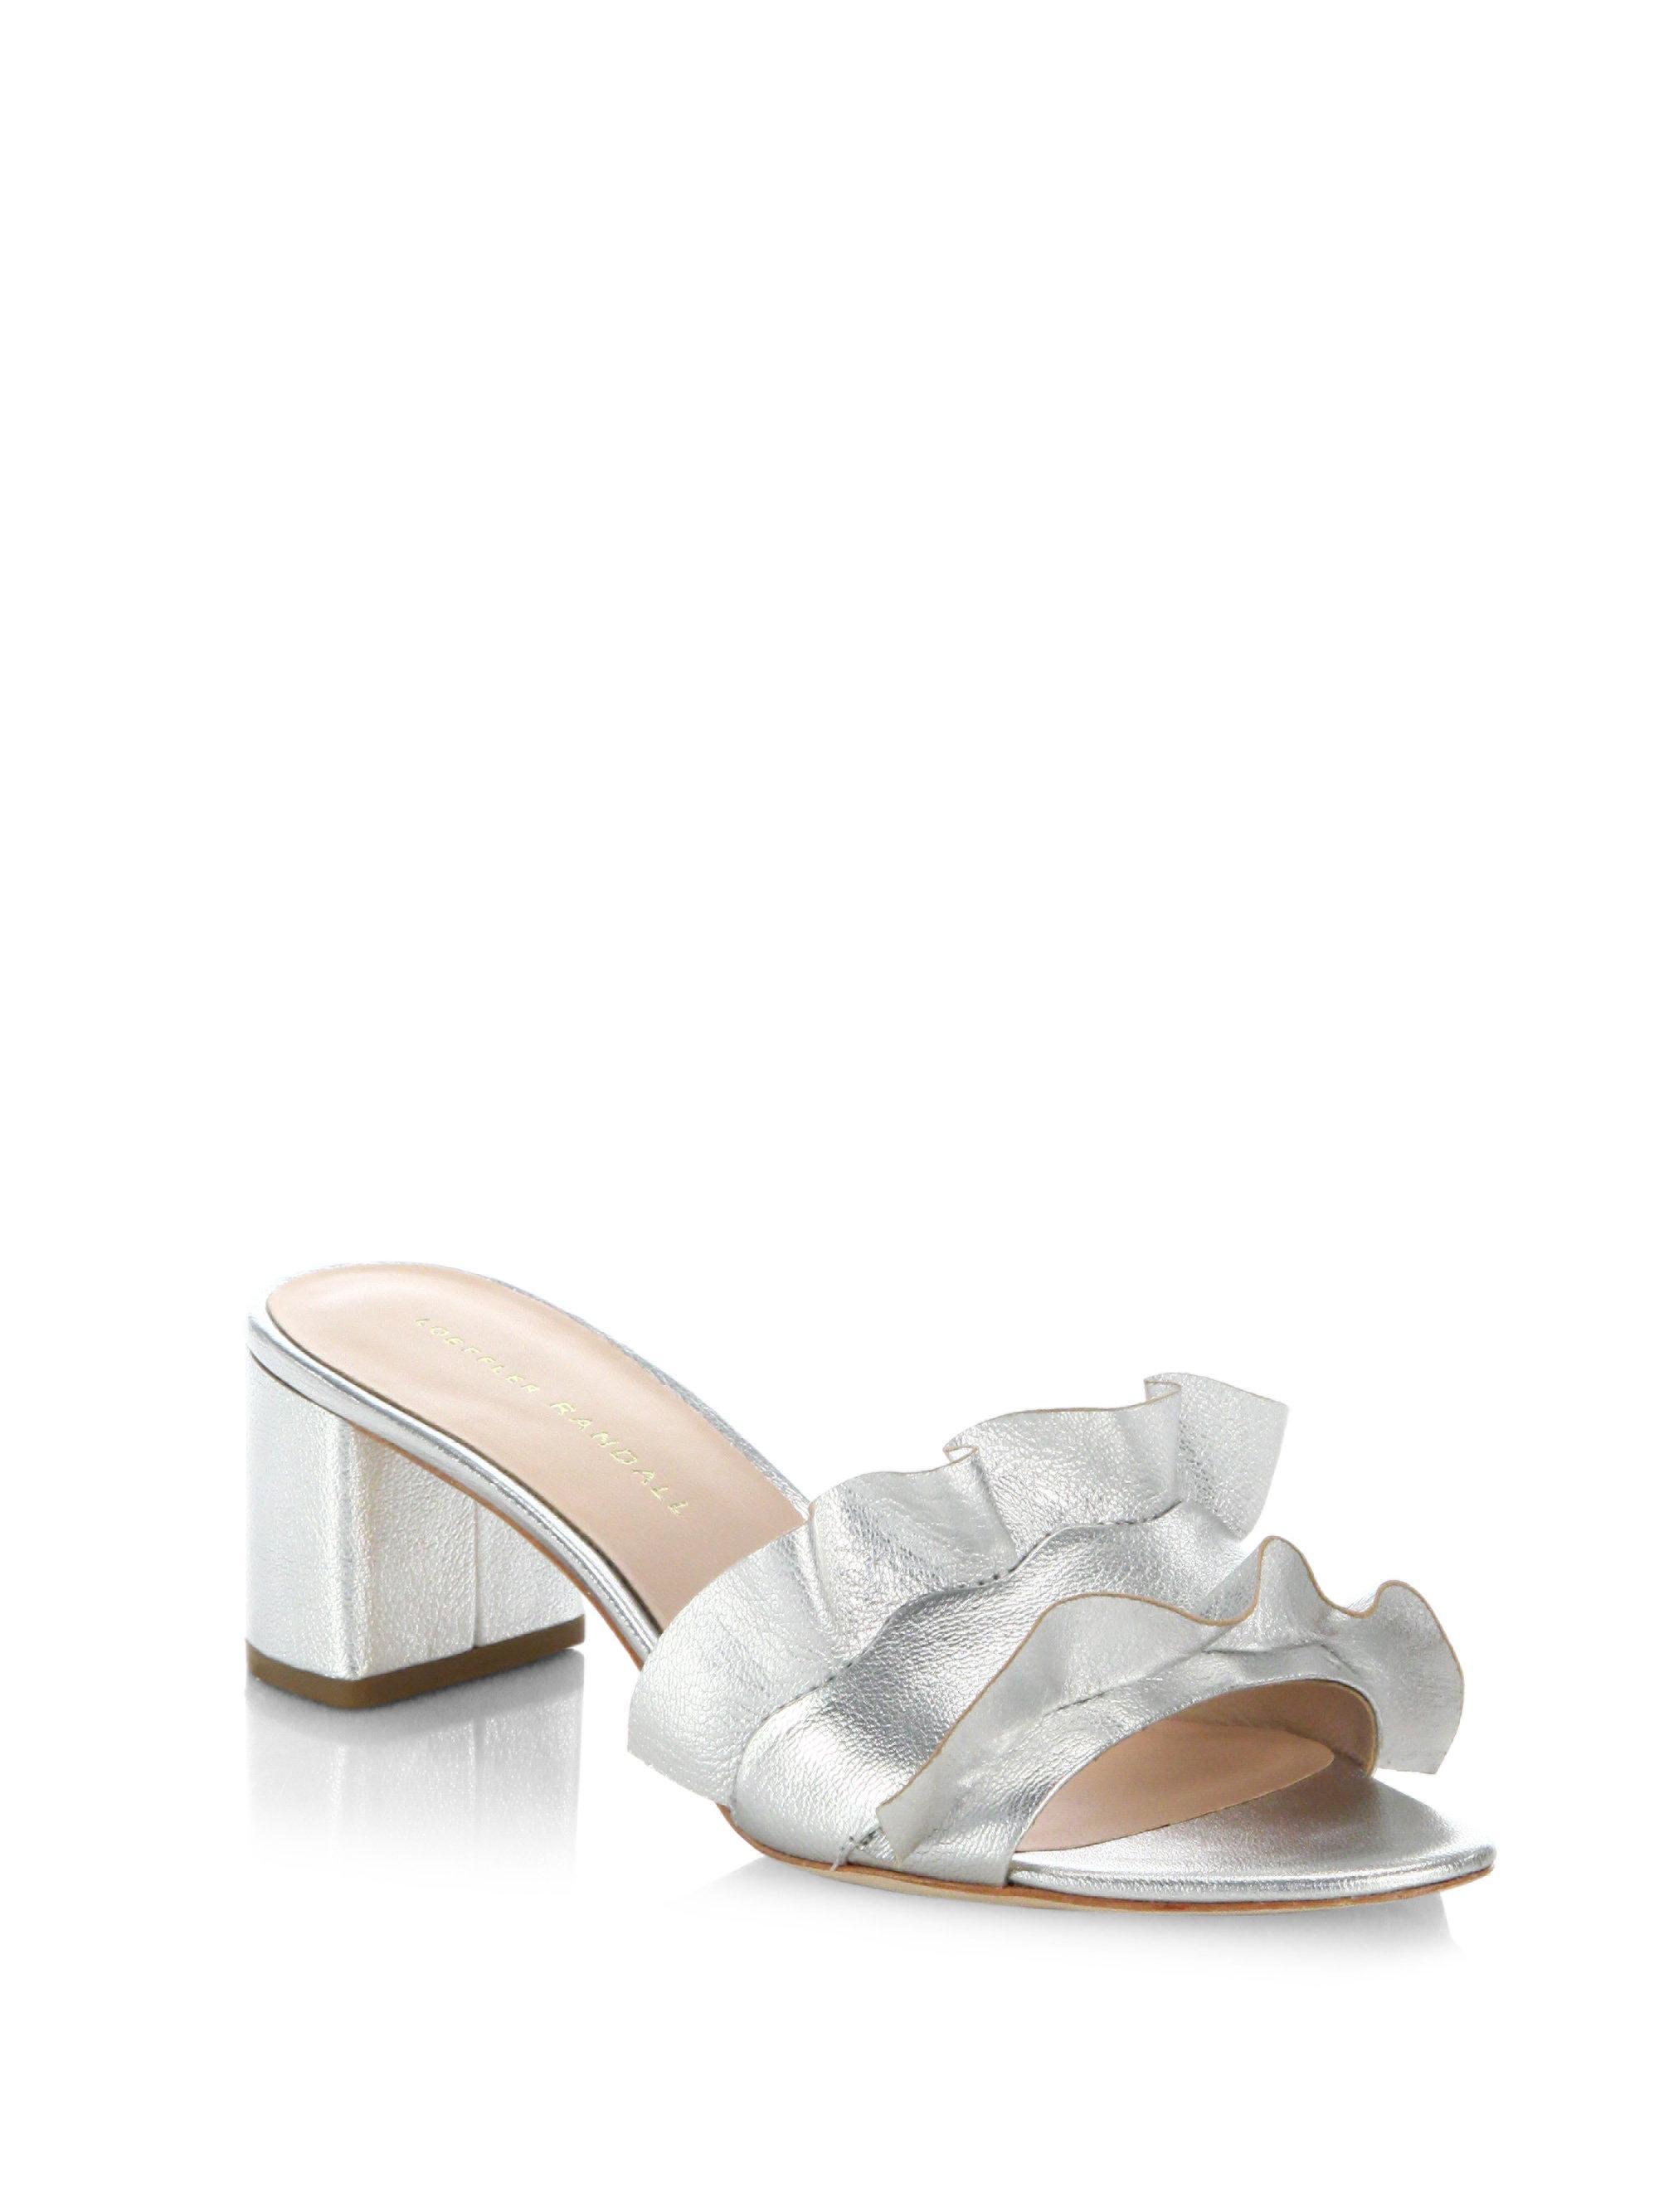 Loeffler Randall Metallic Leather Sandals v0iX4W